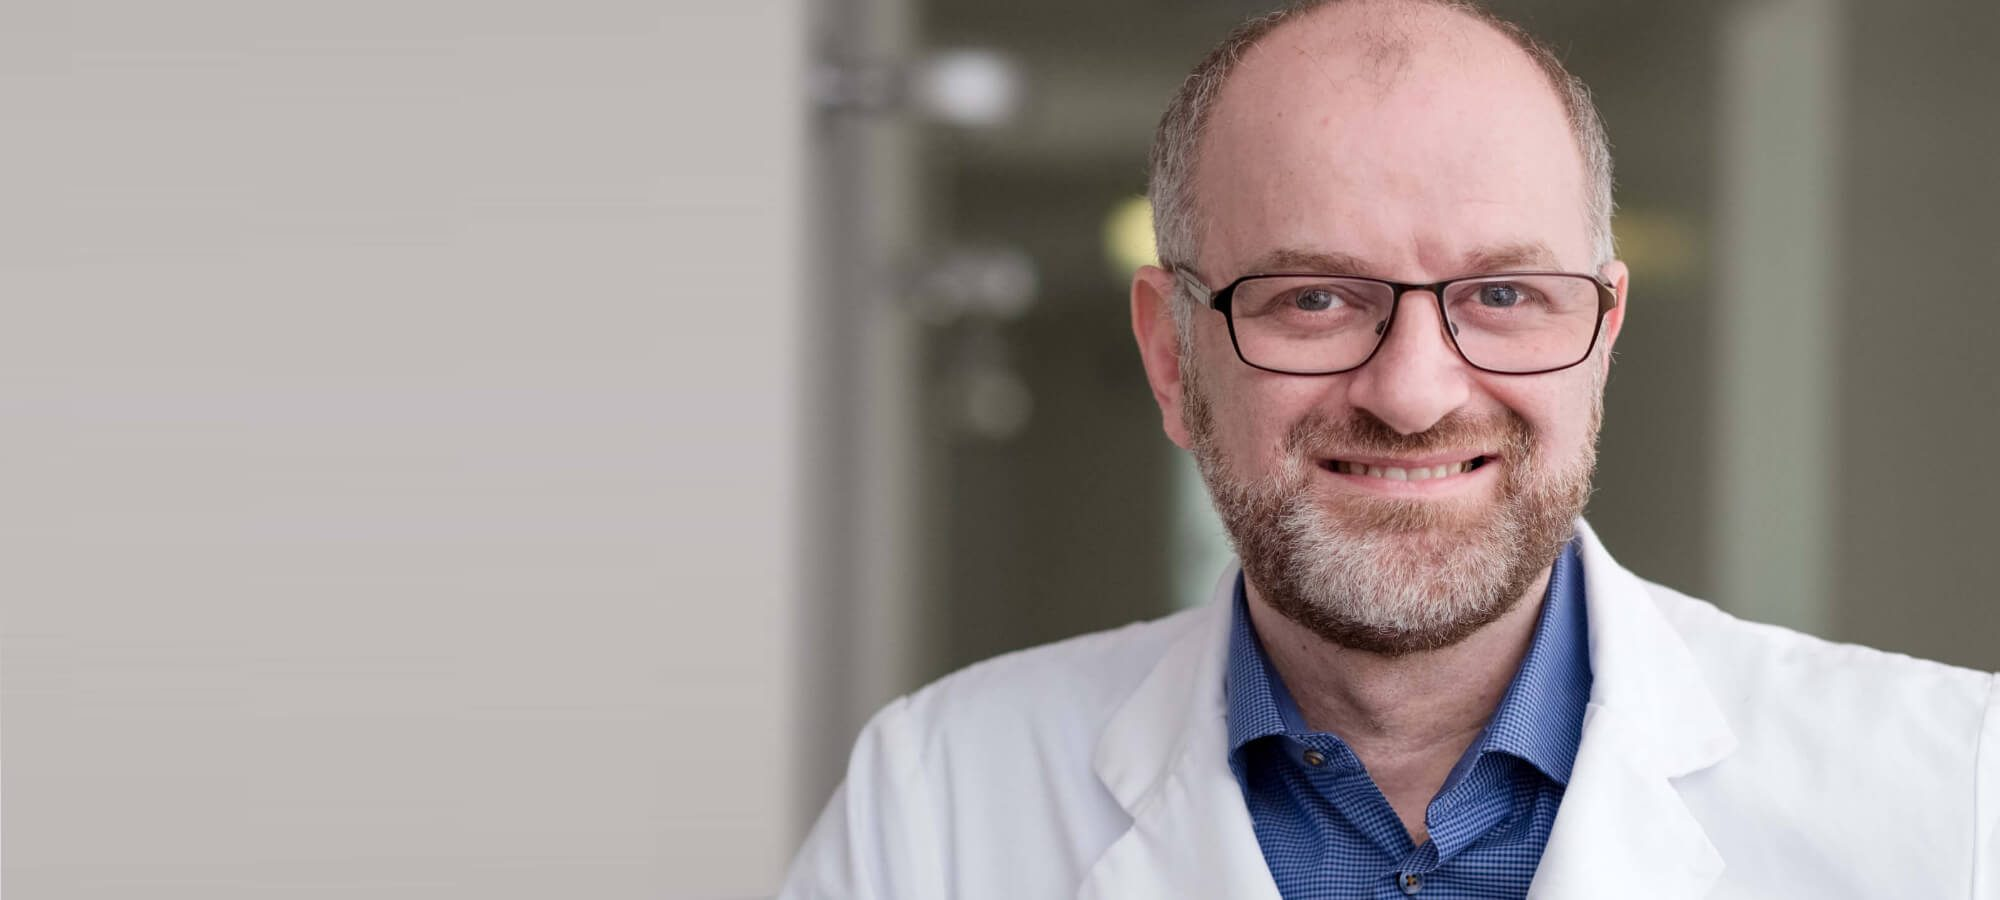 Dr. Dr. Groisman in Frankfurt | groisman & laube